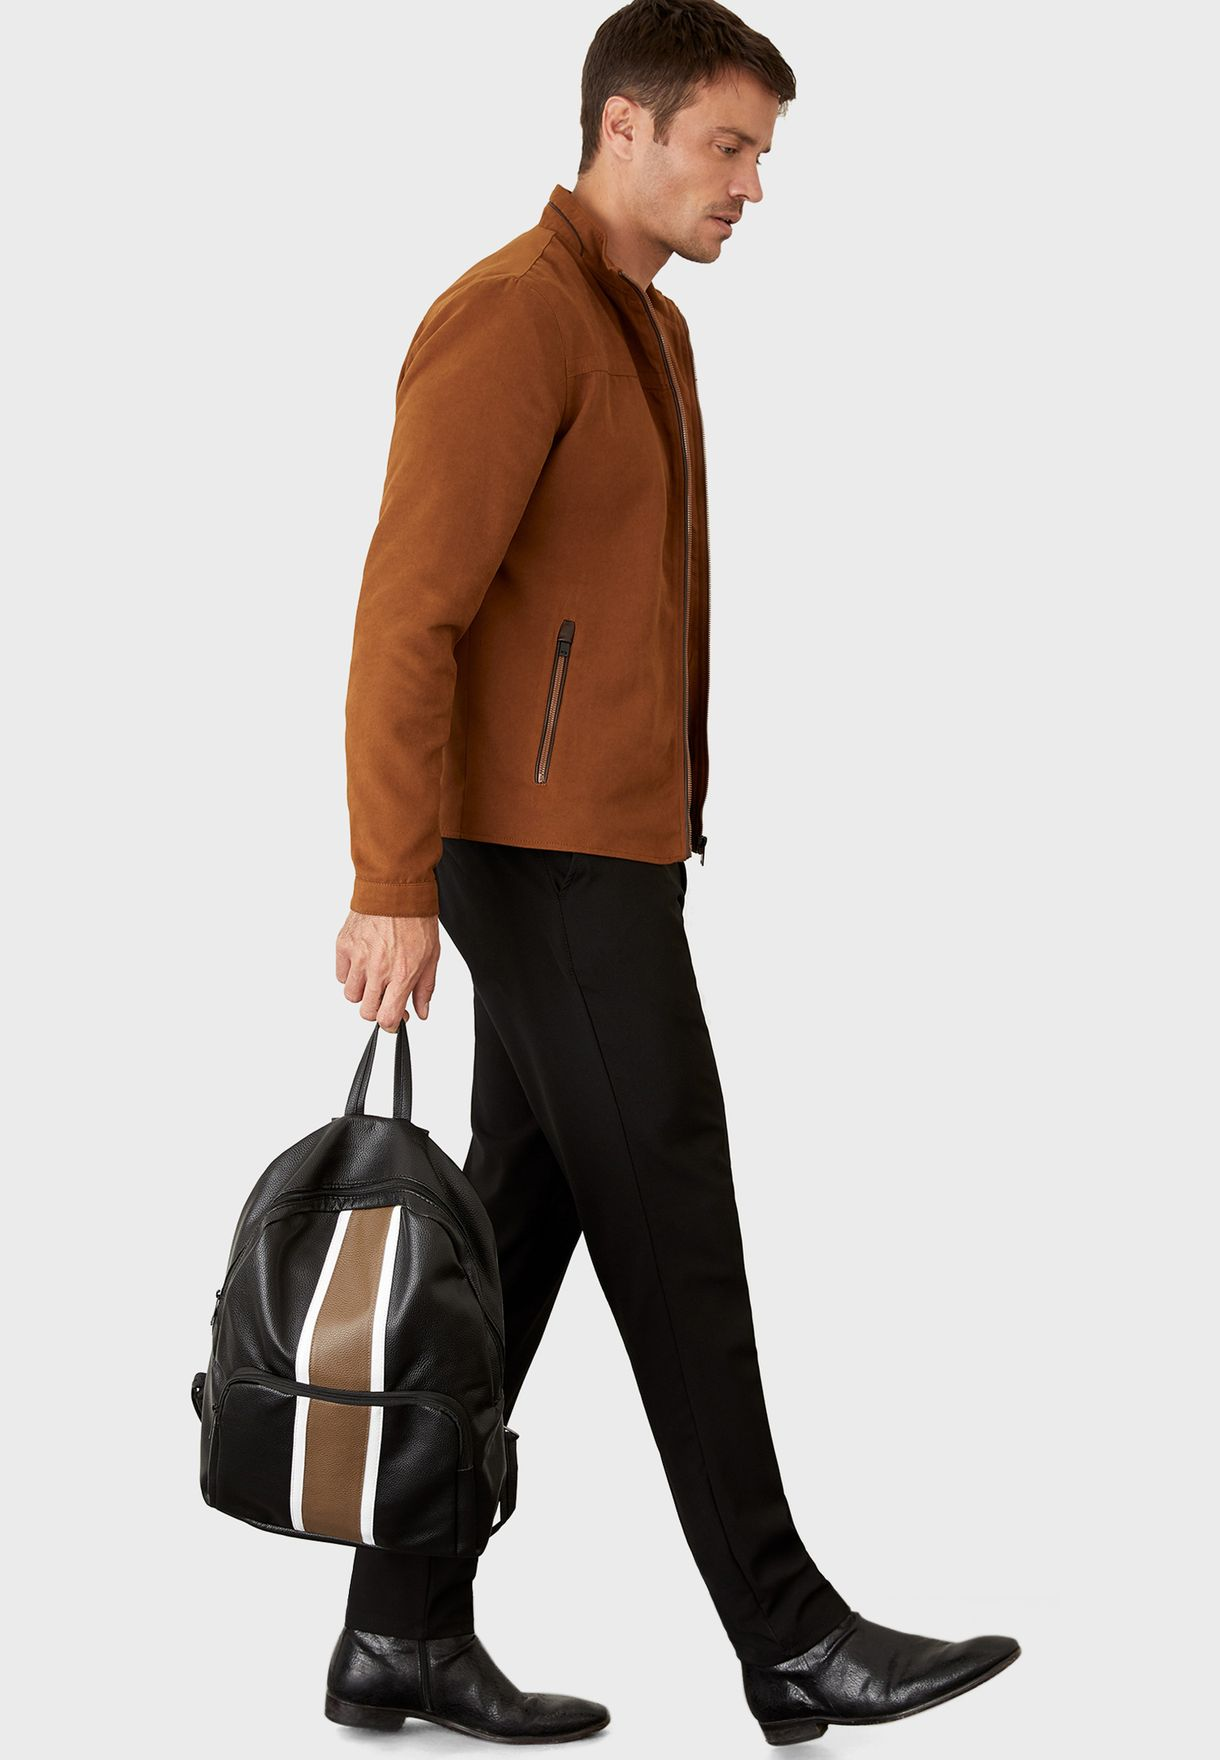 Contrast Zip Detail Backpack